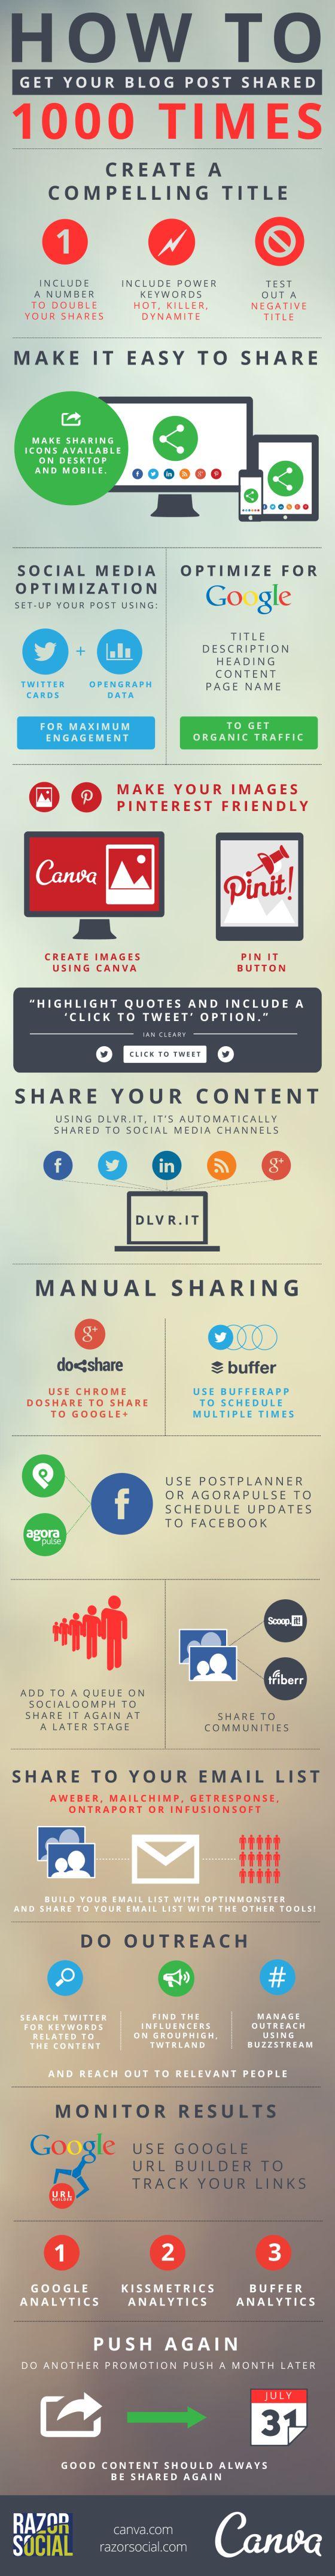 "BLOGGING - ""How To Get Your Blog Post Shared 1,000 Times [#INFOGRAPHIC] #socialmedia #blog #blogging""."